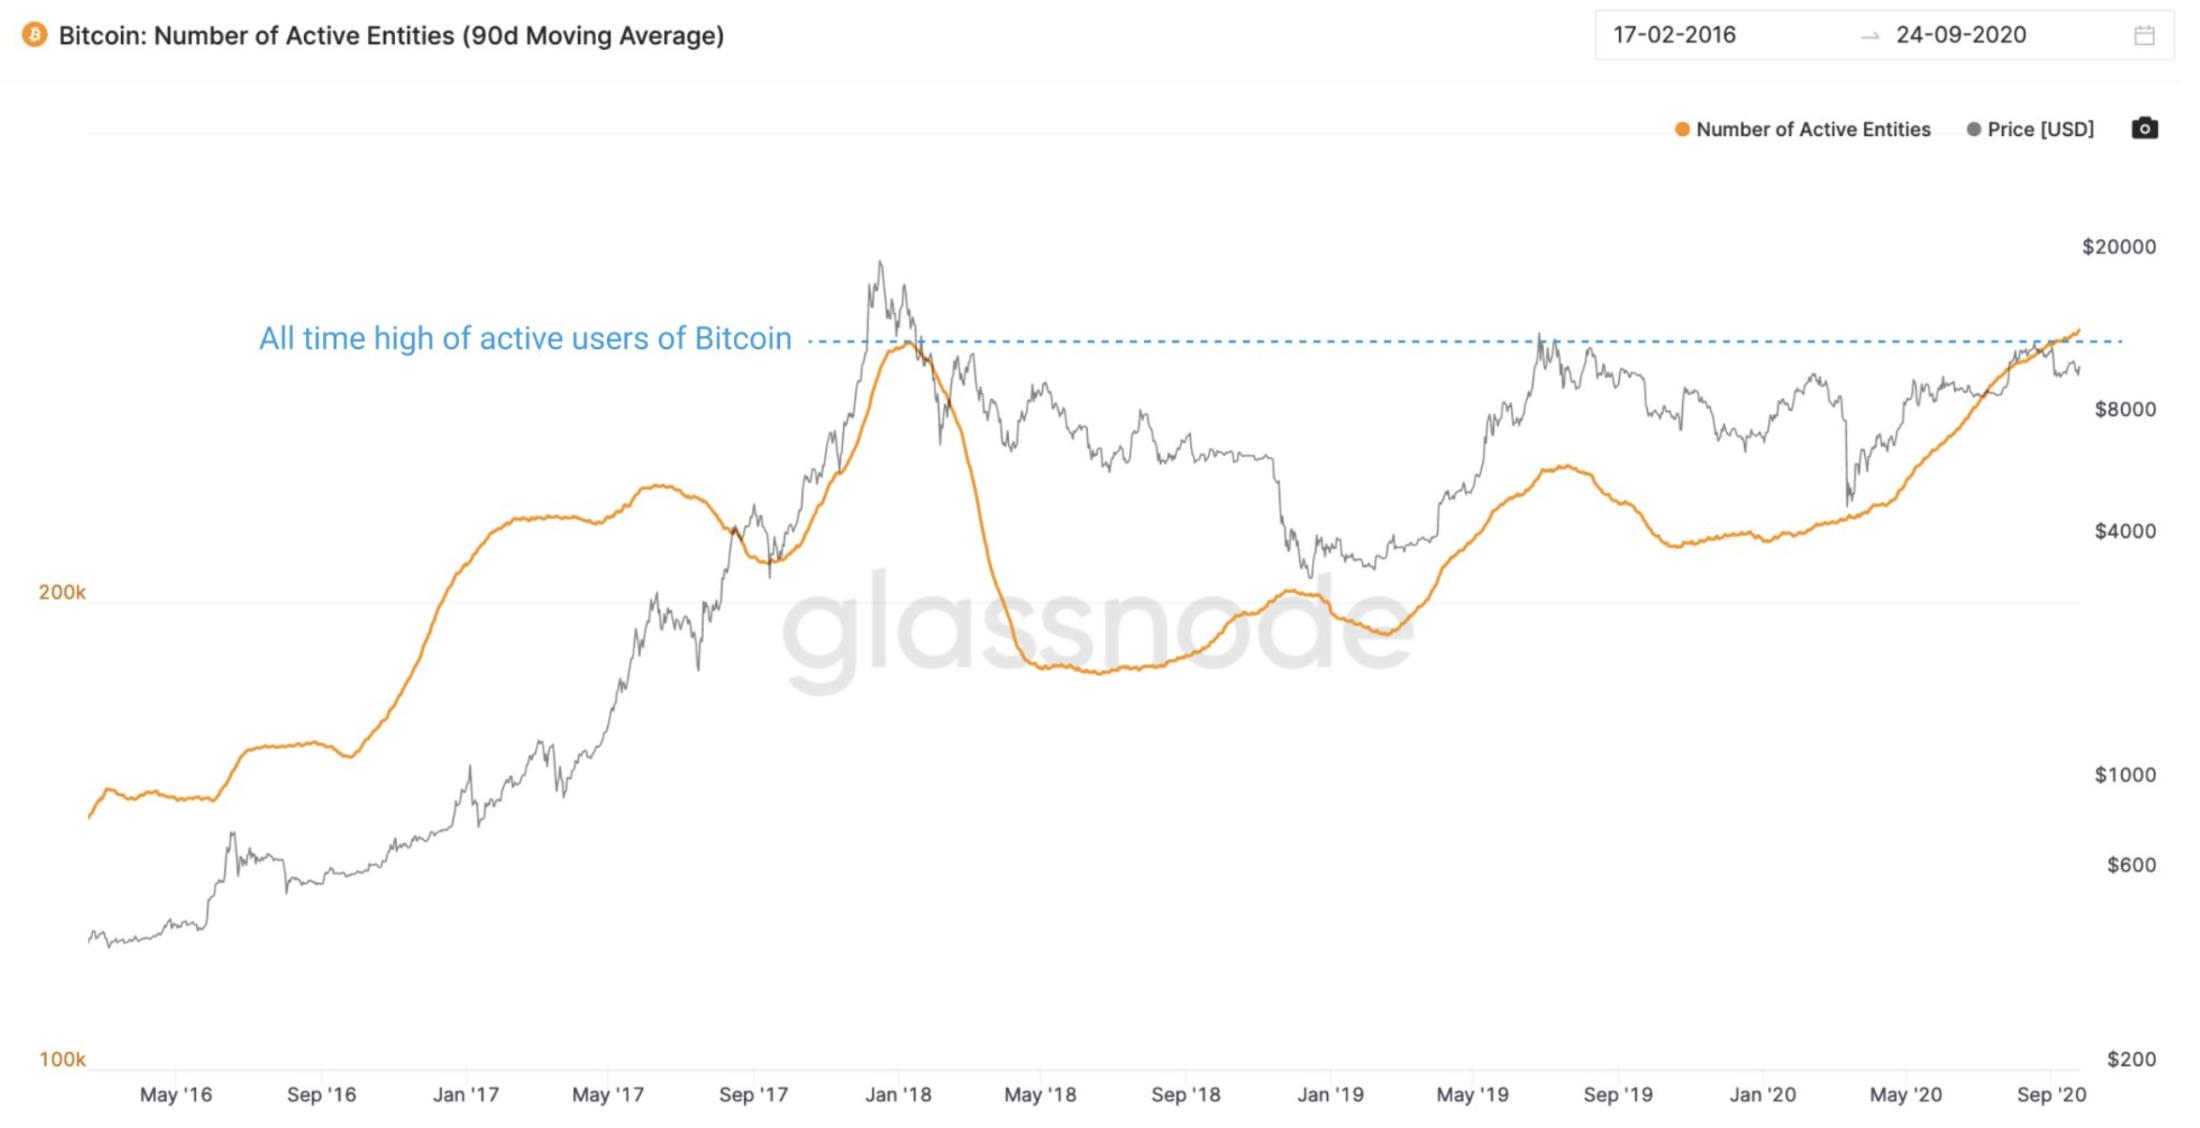 The Case For Bitcoin Decoupling From The Stock Market Market Rebellion